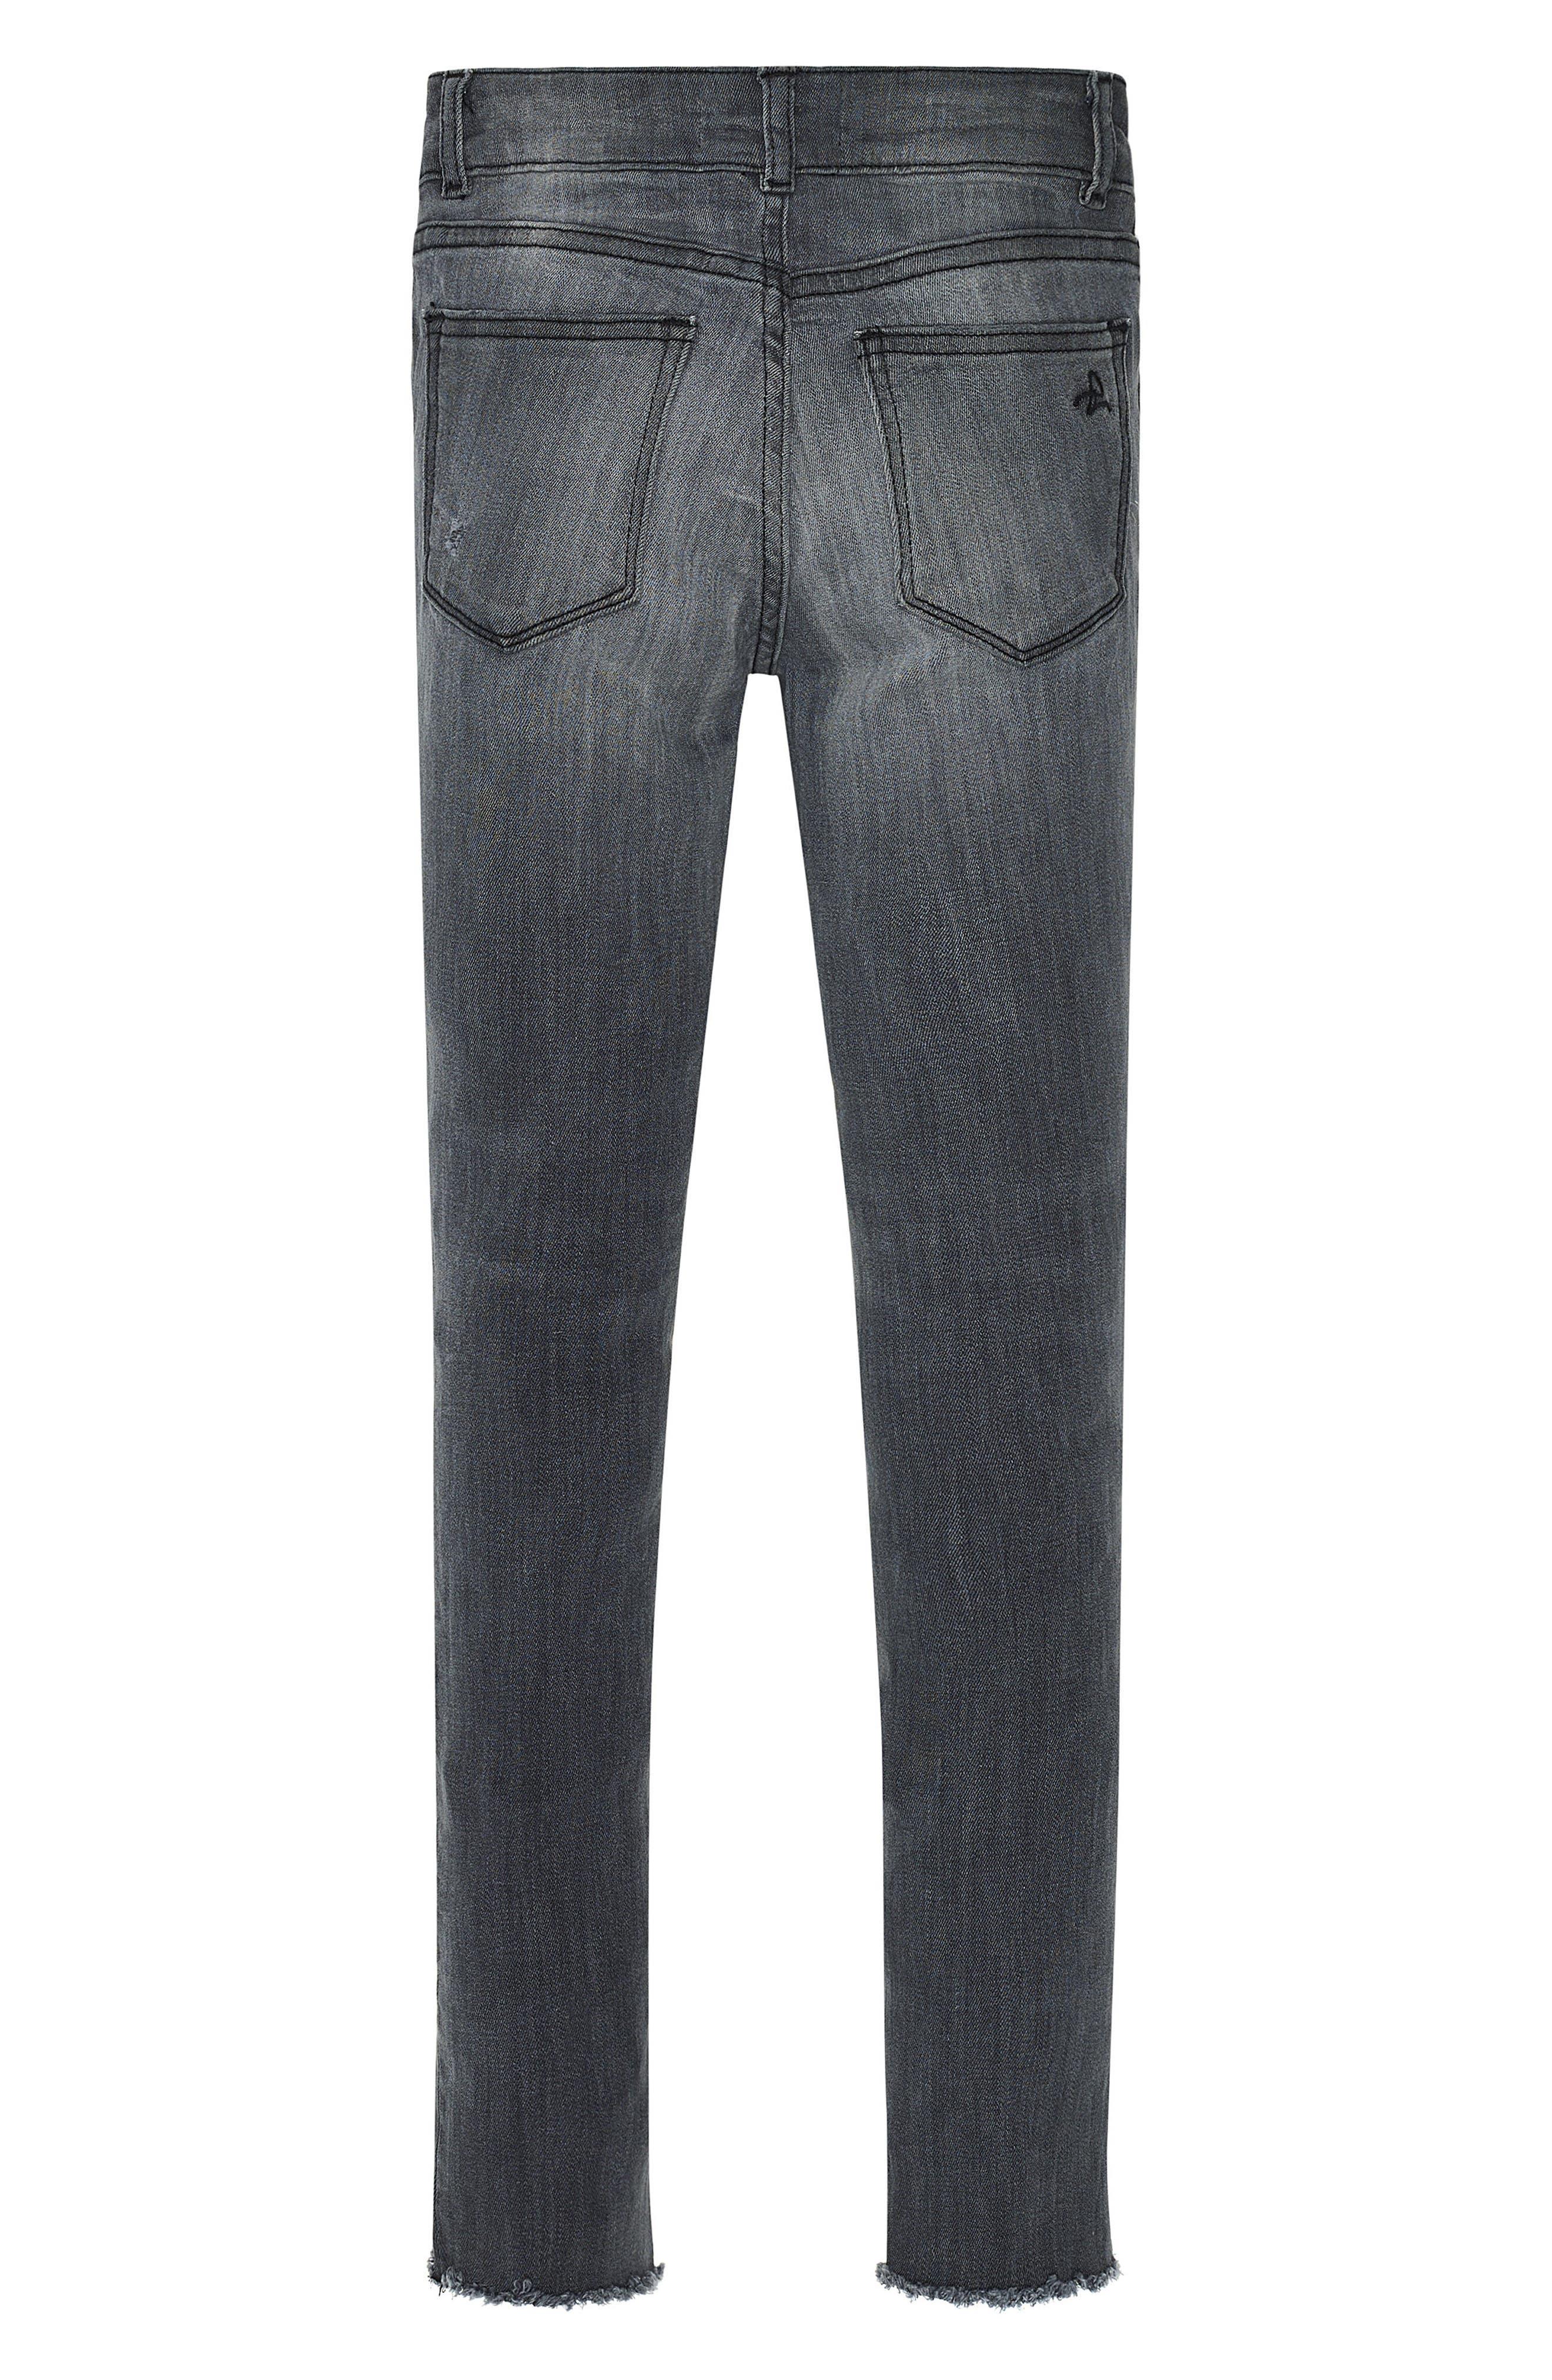 Chloe Raw Hem Skinny Jeans,                             Alternate thumbnail 2, color,                             025